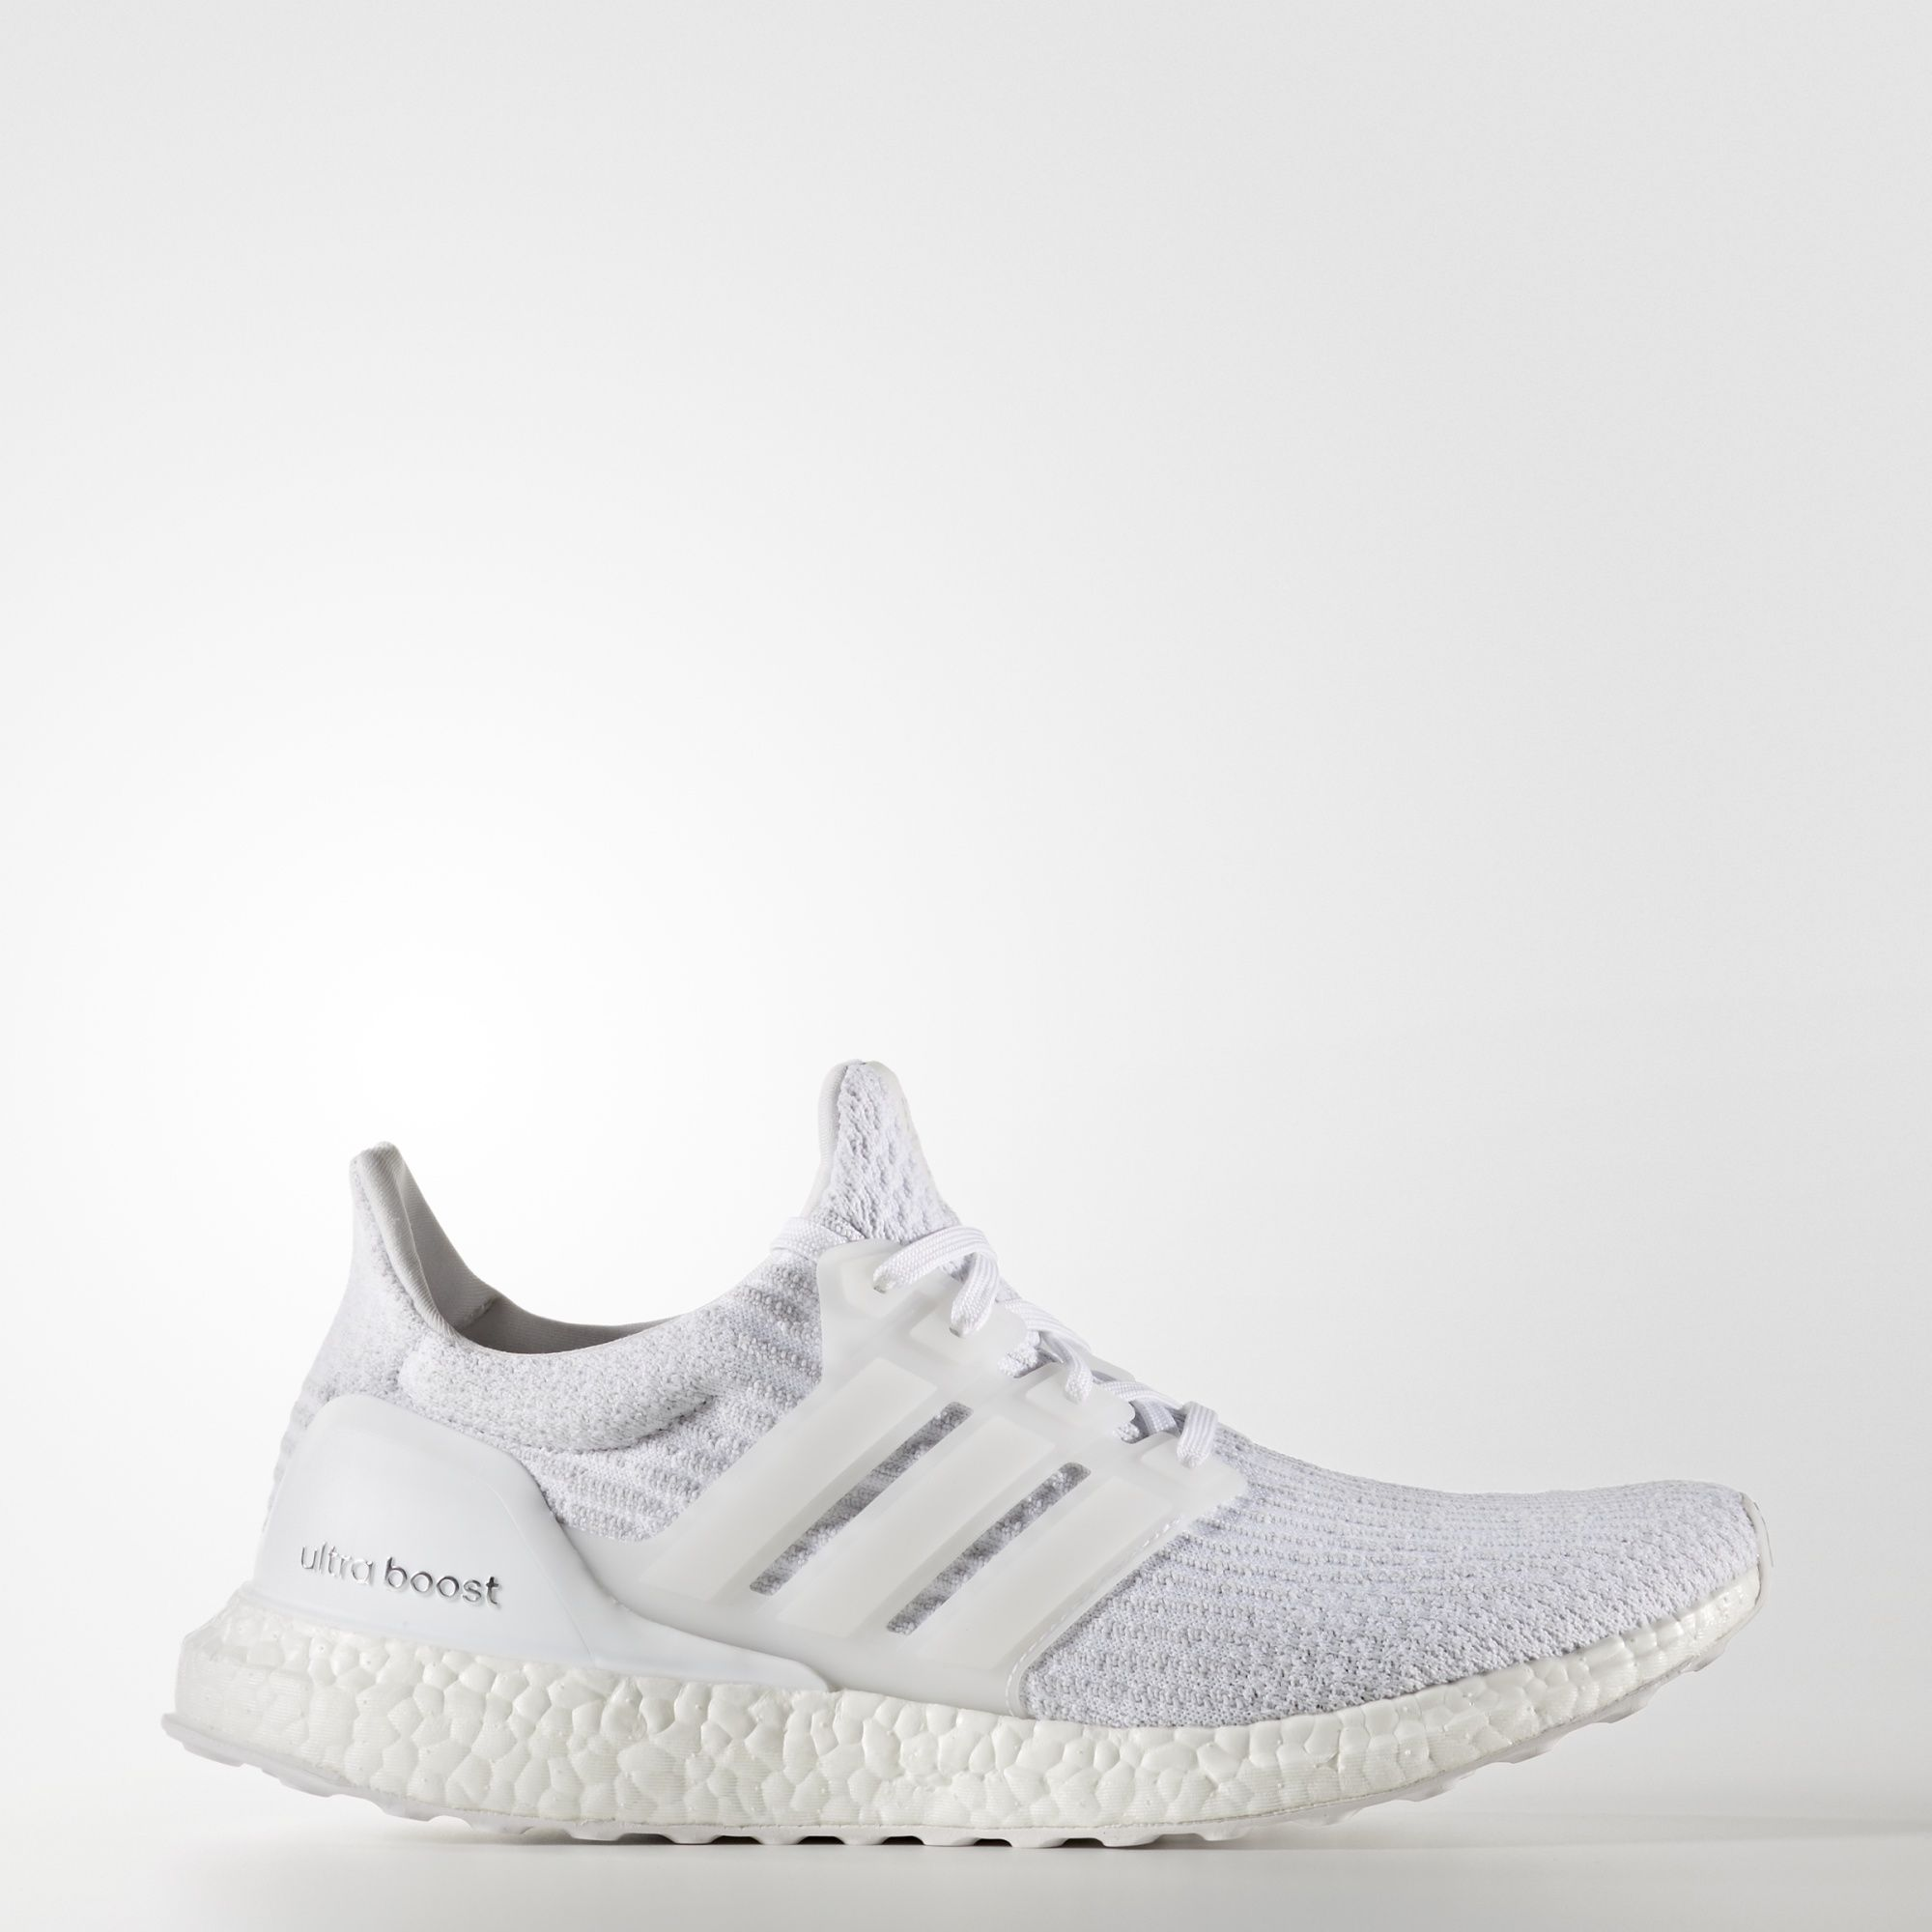 adidas Ultra Boost 3 0 Triple White BA8841 1